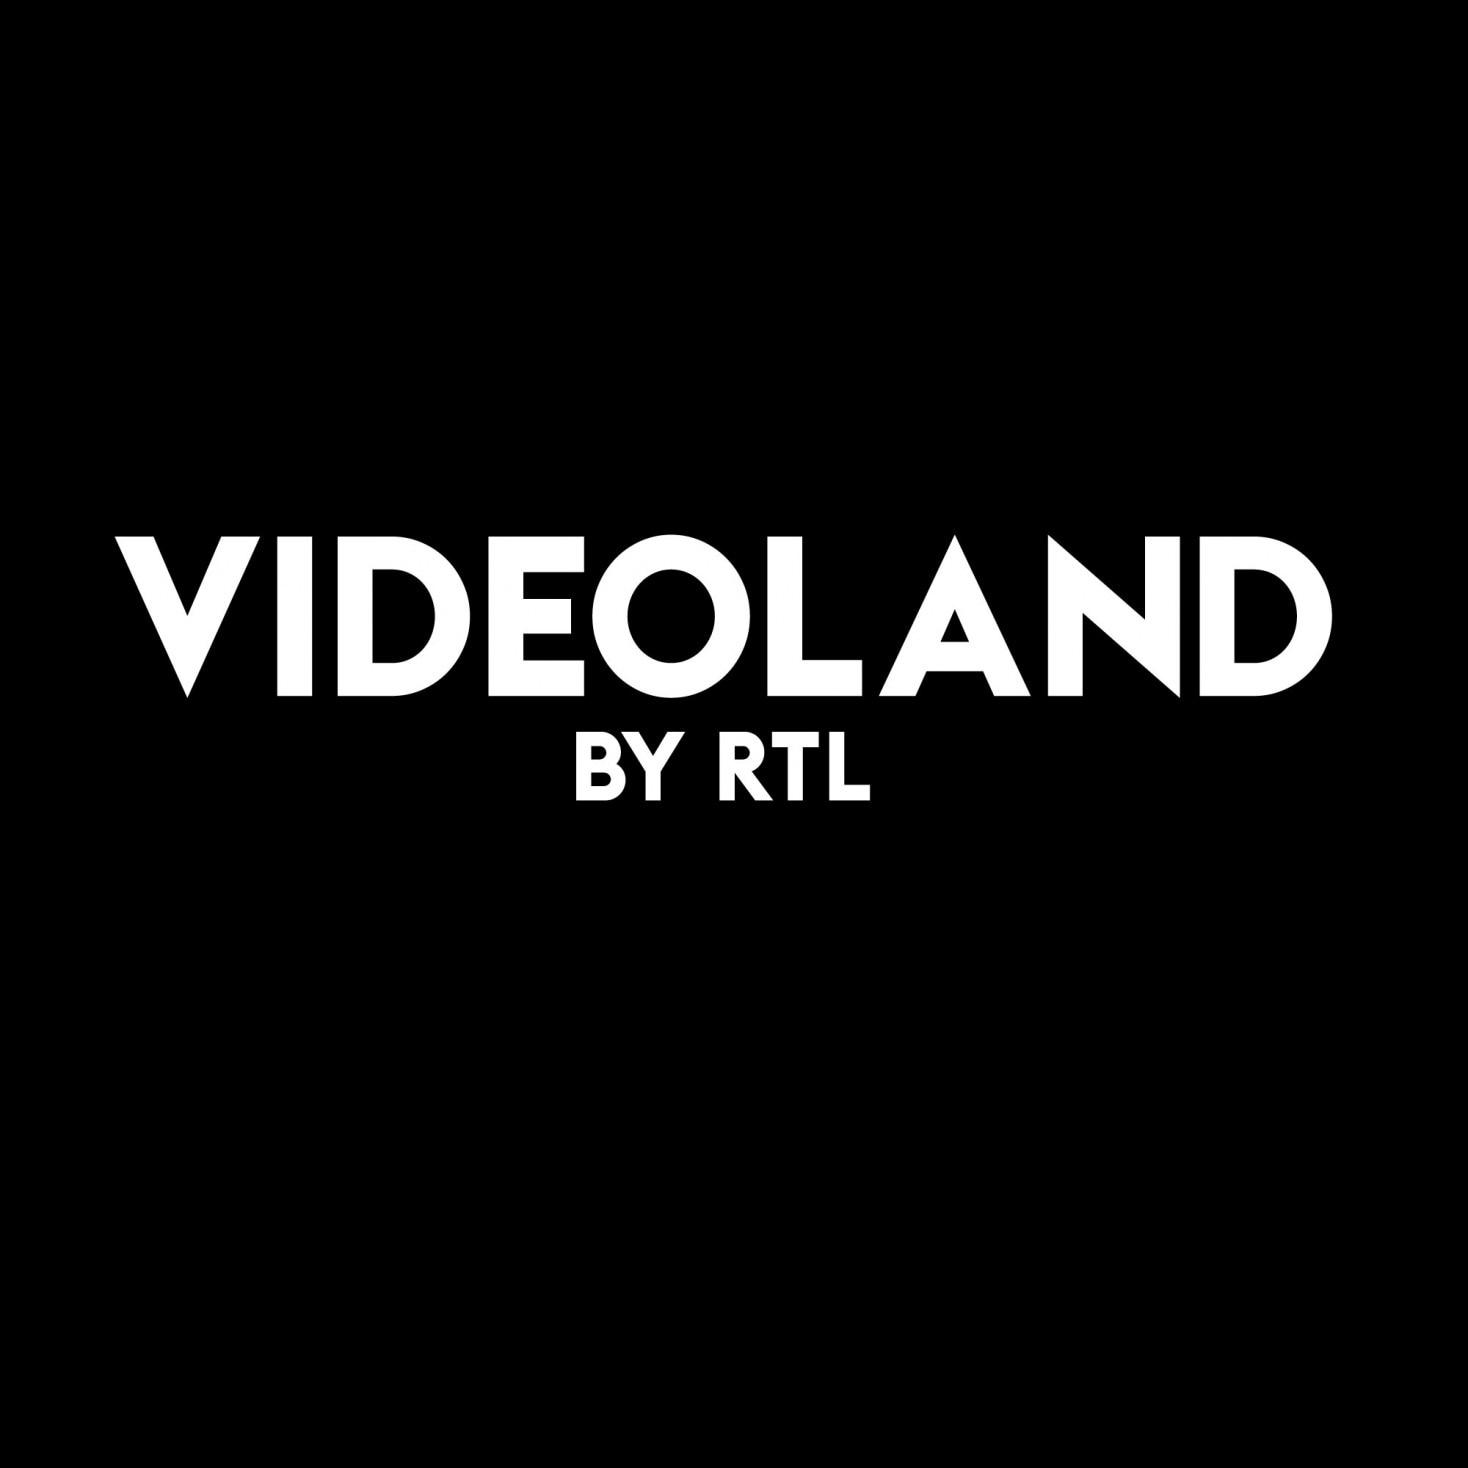 Videoland UHD Нидерланды ЕС работает на NAIFEE JOY PC IOS Android Smart TV Set Top Box Tablet PC